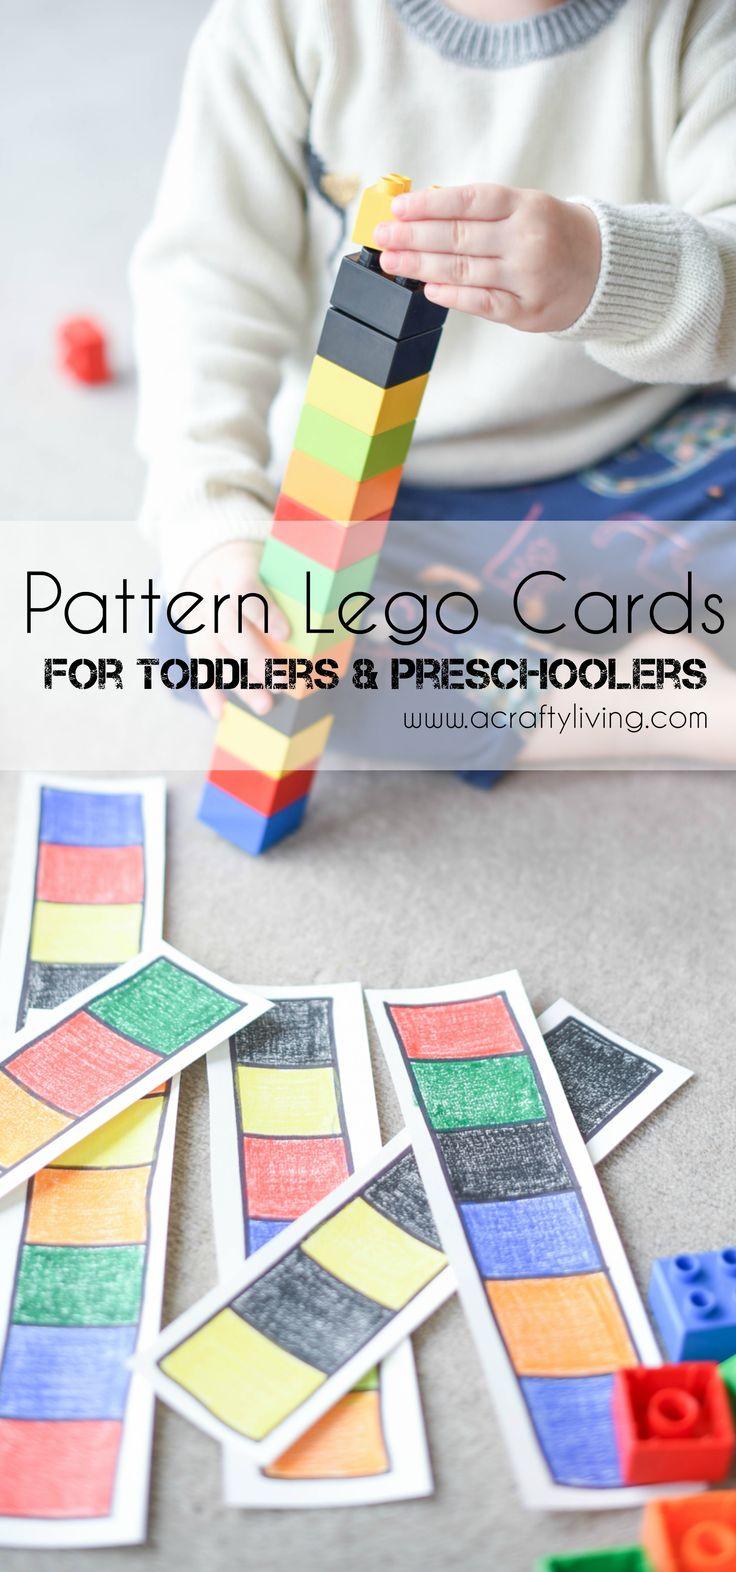 DIY Lego Pattern Cards for Toddlers & Preschoolers! www.acraftyliving.com